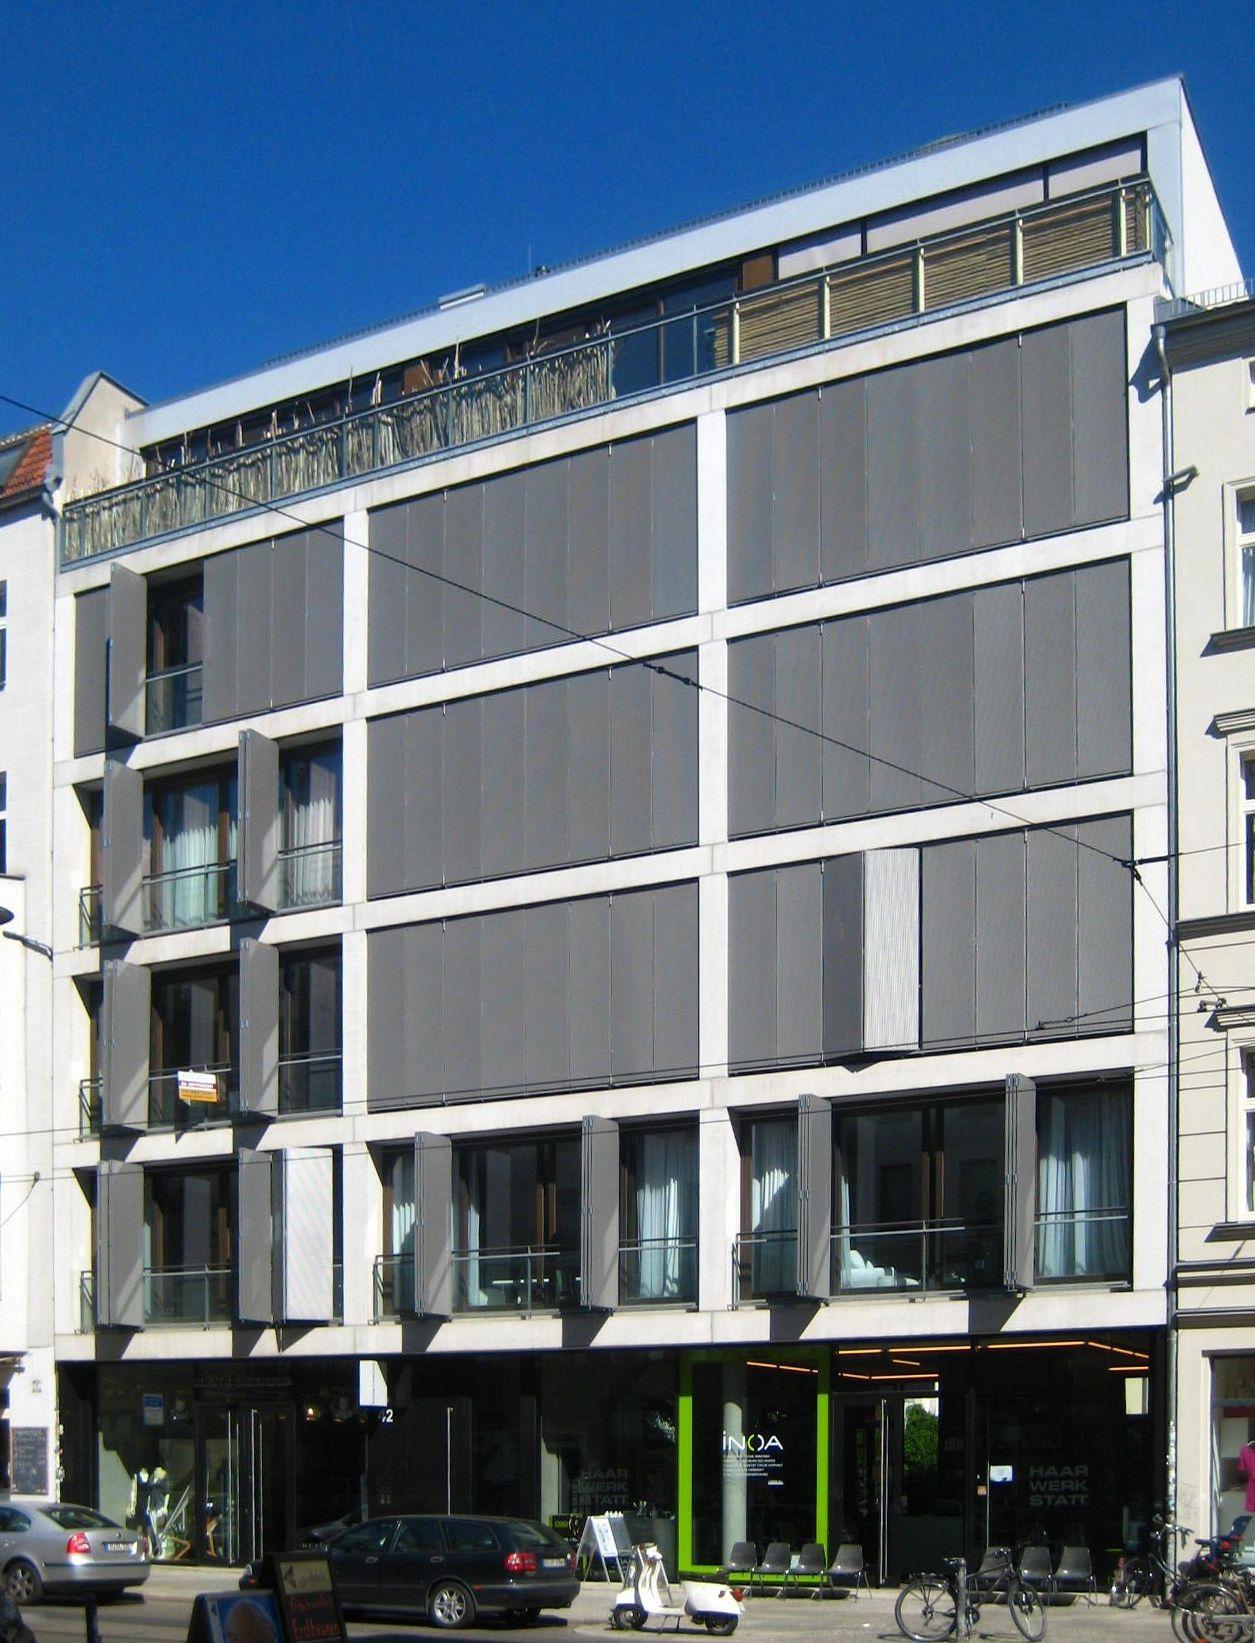 file berlin mitte alte schoenhauser strasse 42 wohn und wikimedia commons. Black Bedroom Furniture Sets. Home Design Ideas